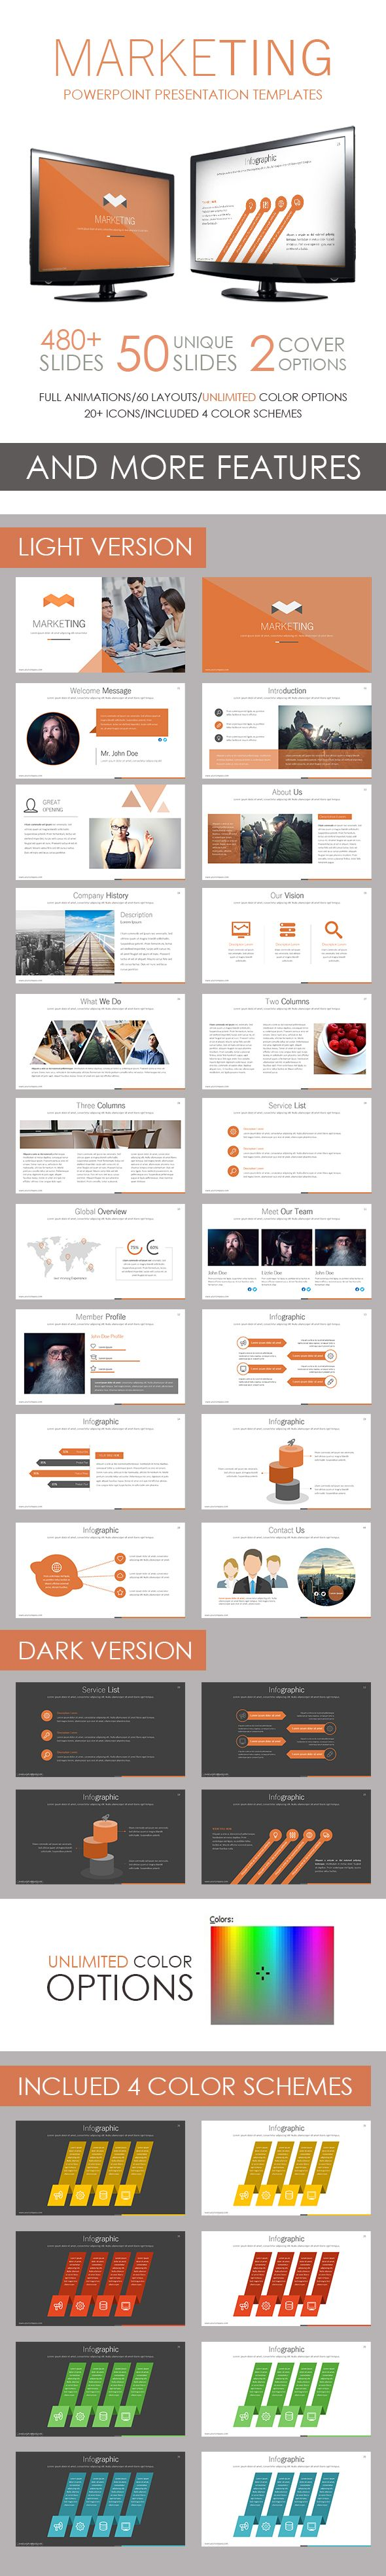 Marketing PowerPoint Template #slides #design Download: http://graphicriver.net/item/marketing-powerpoint-template/14201769?ref=ksioks